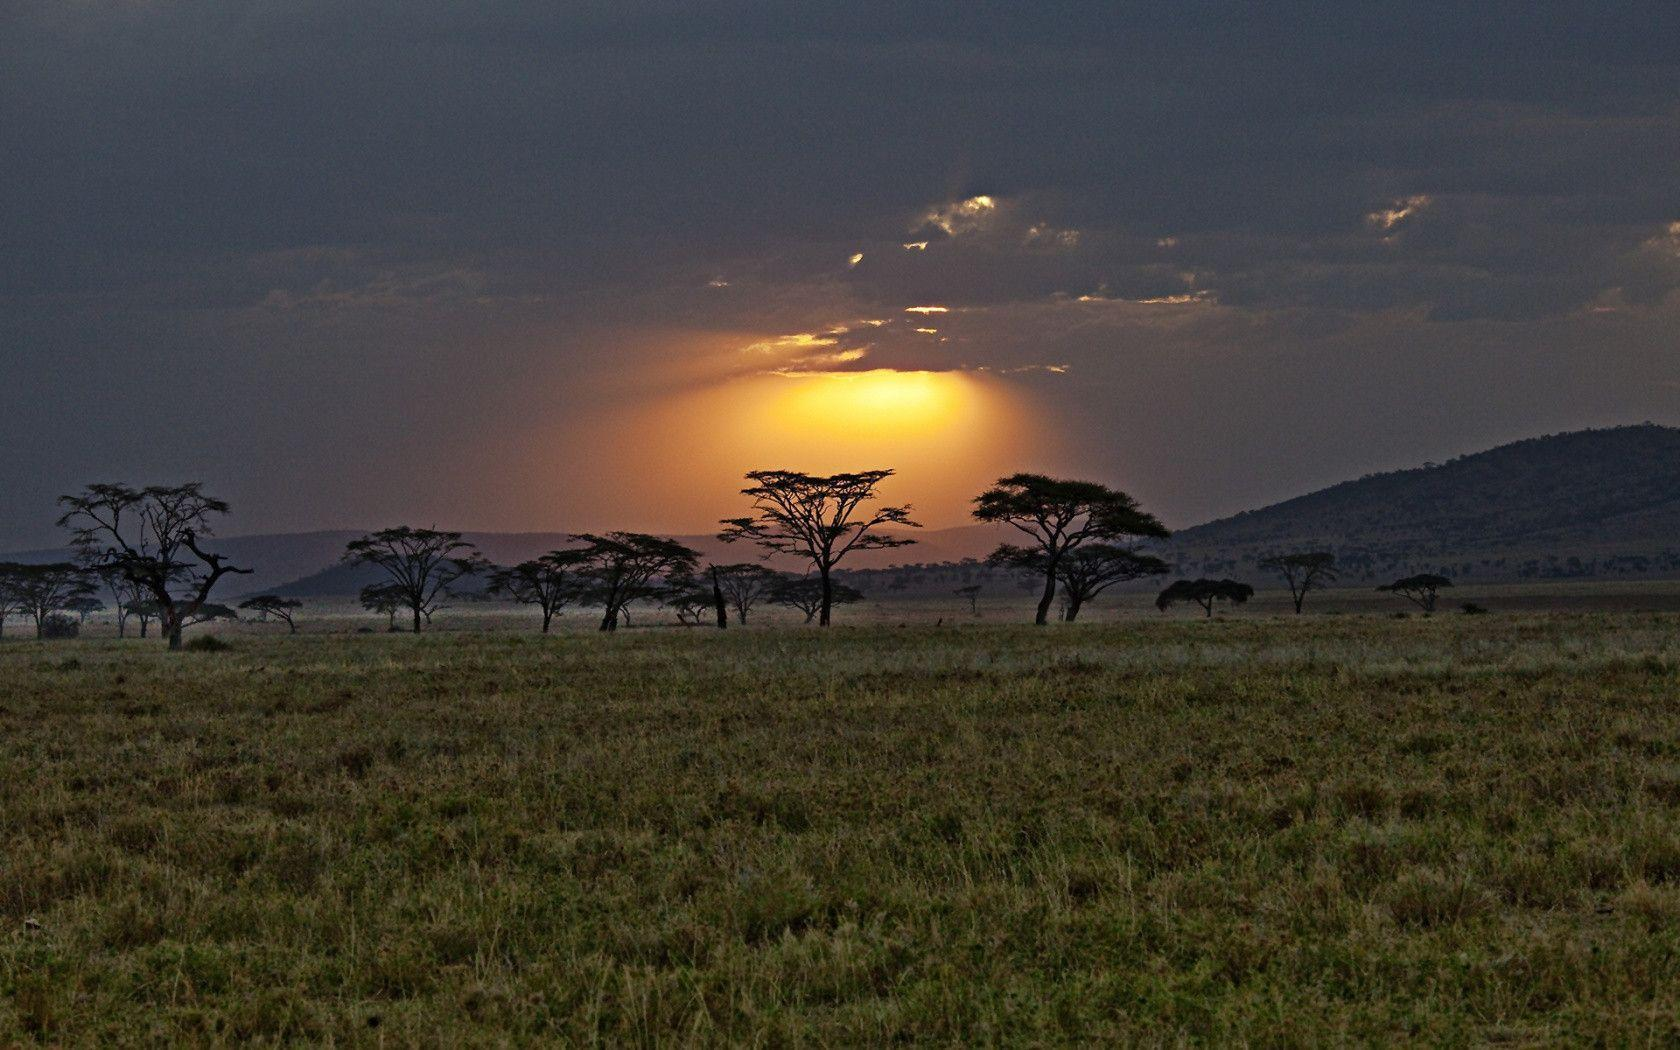 1680x1050 Sunset kenya africa Wallpaper